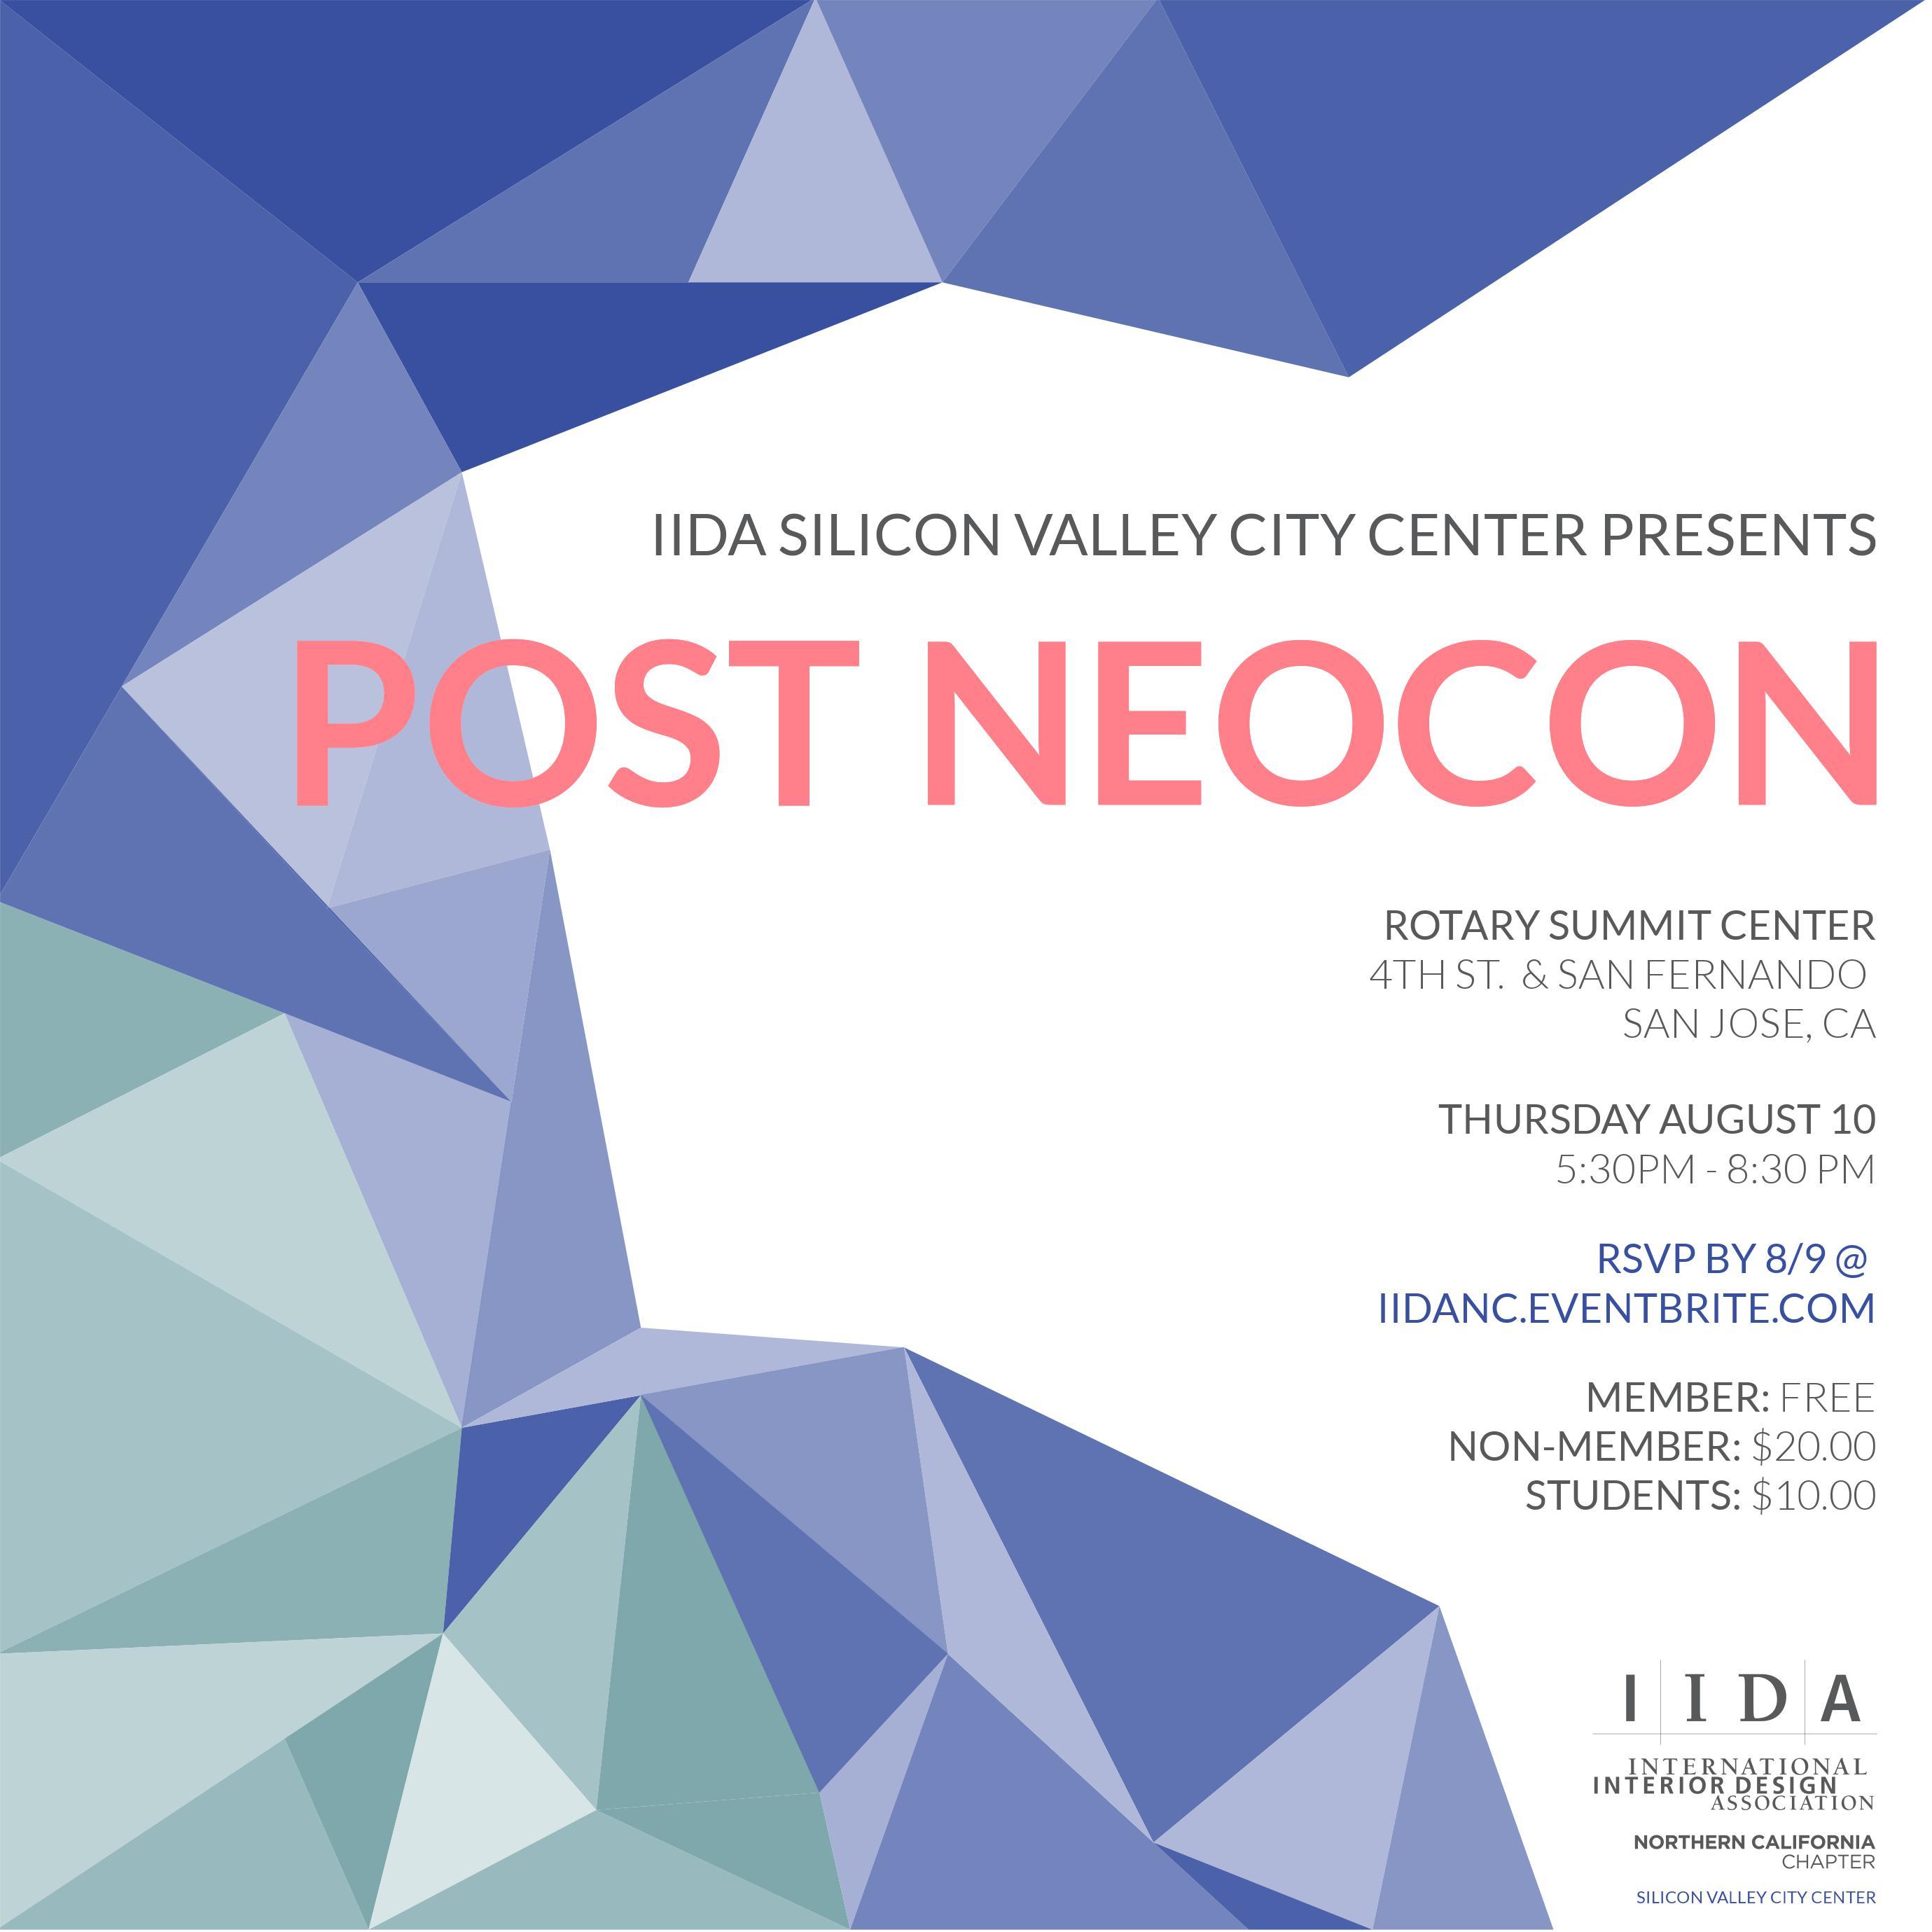 IIDA Silicon Valley Post Neocon Tickets Thu Aug 10 2017 At 530